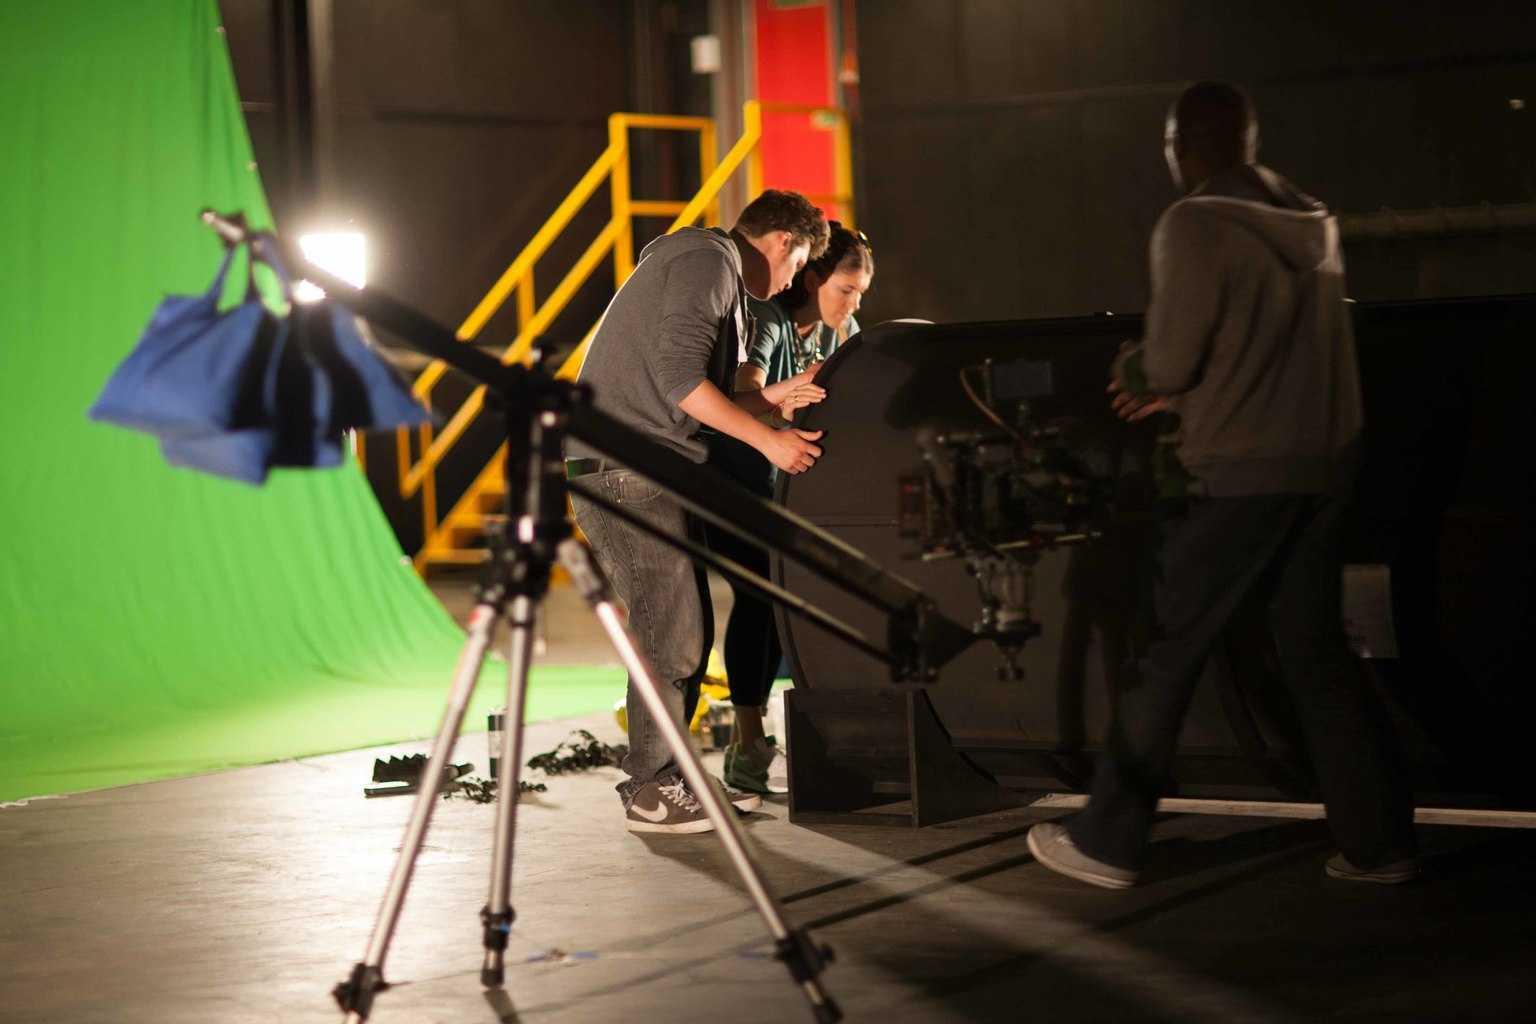 leeds video production company